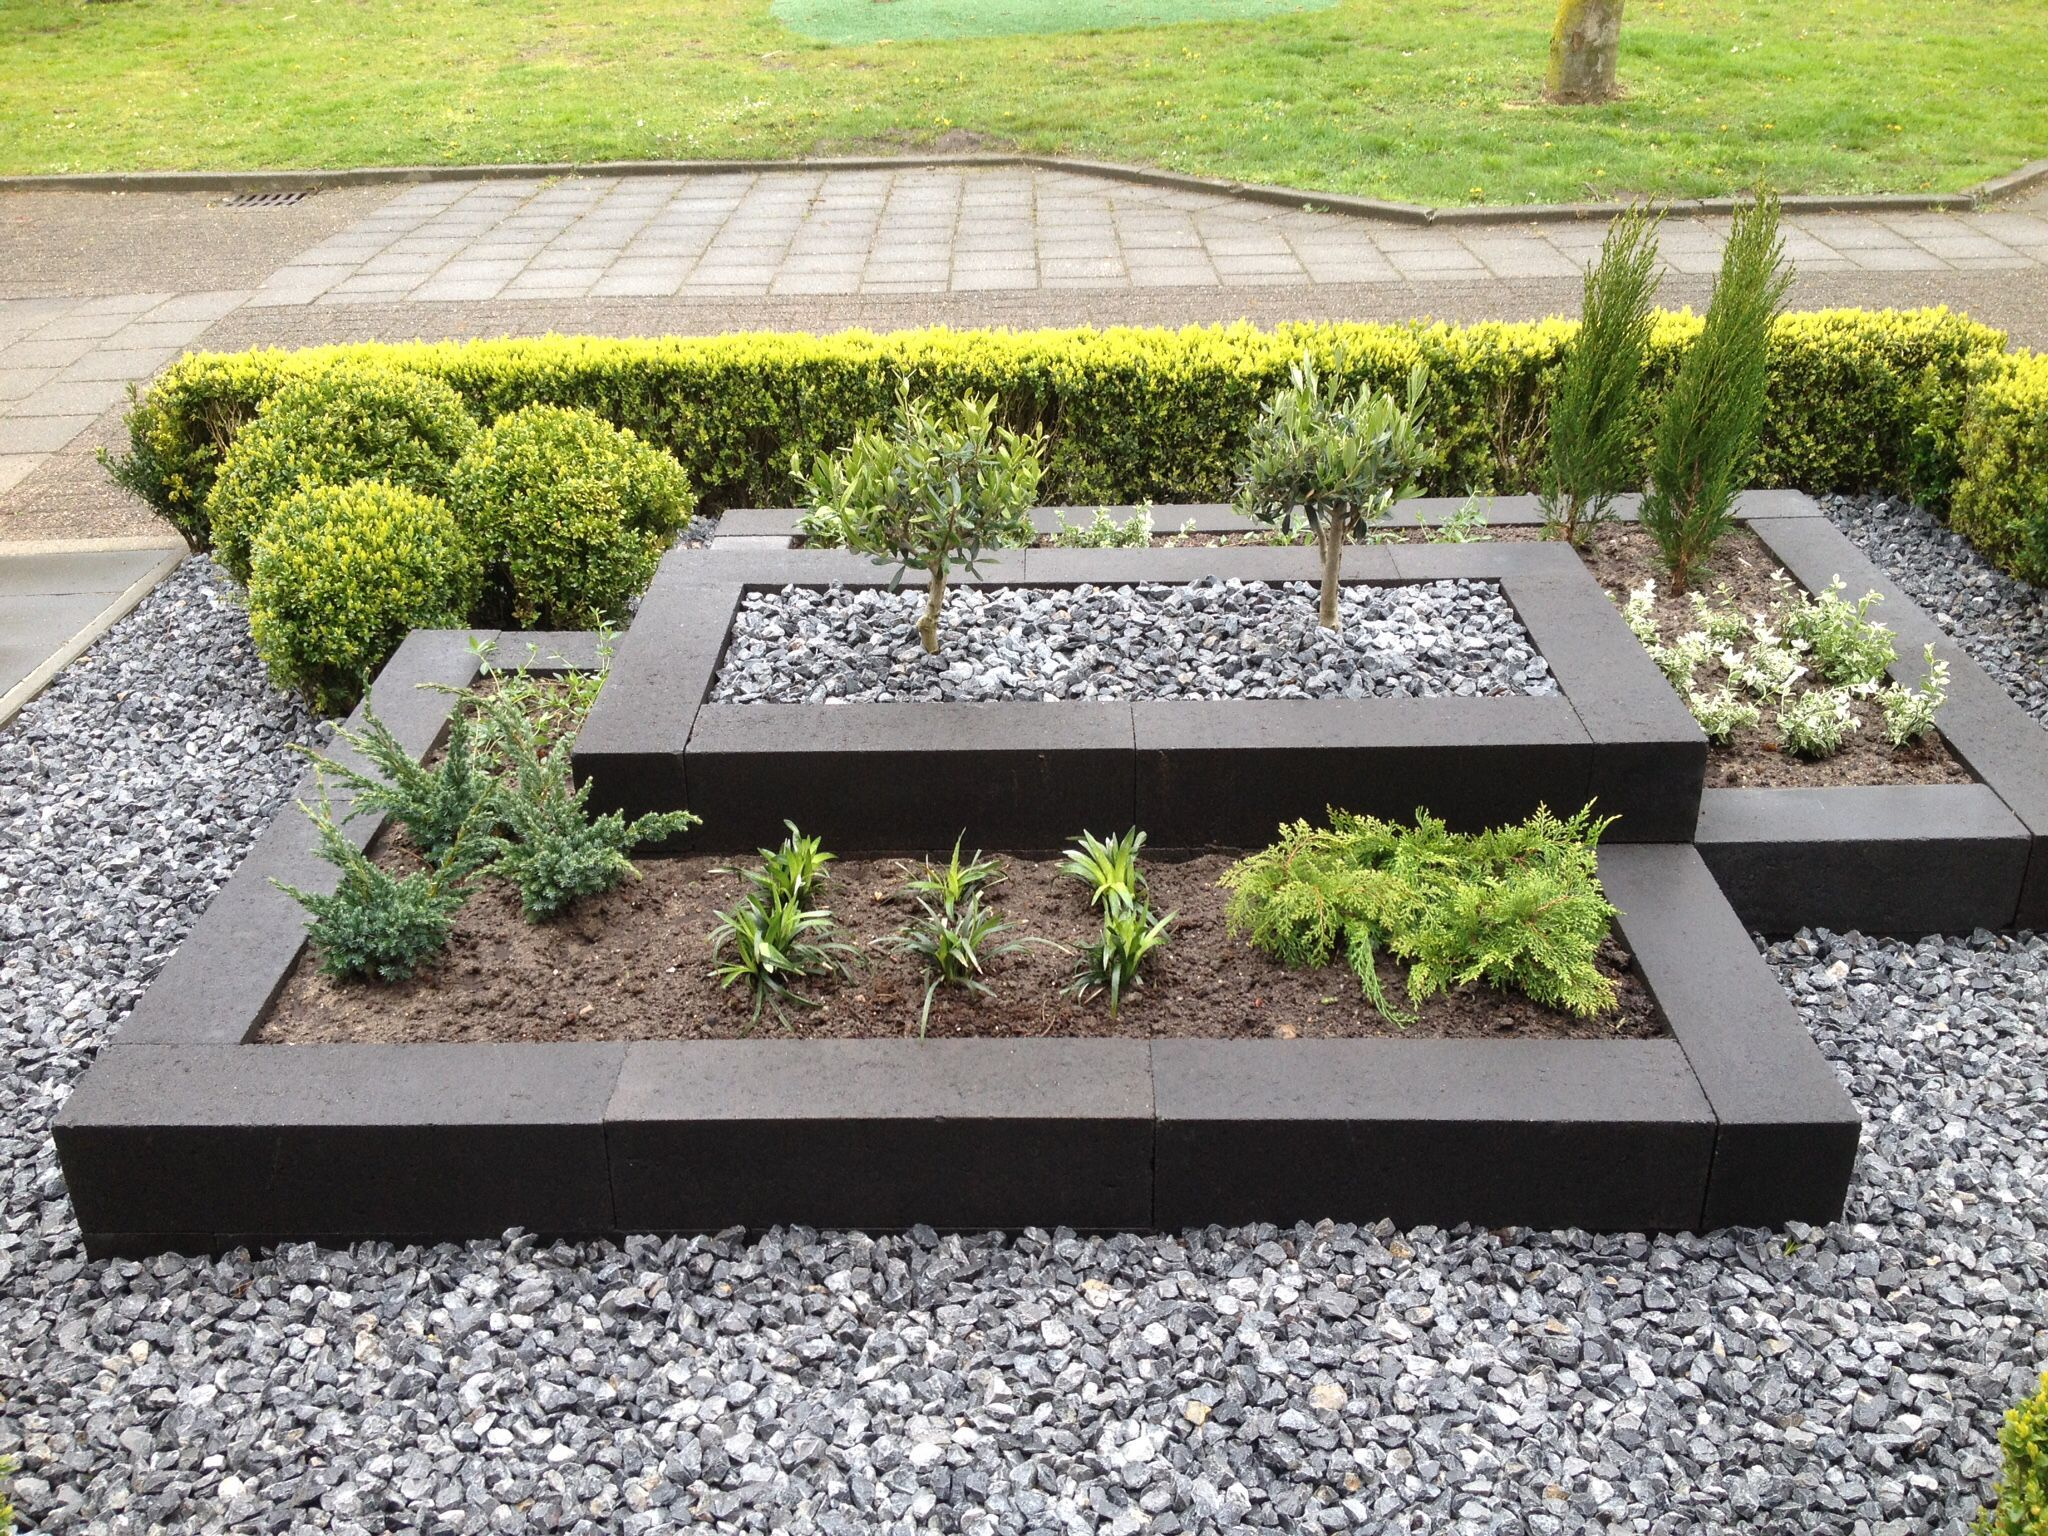 Strakke Voortuin Design De Jardin Potager Design Jardin Idees Jardin